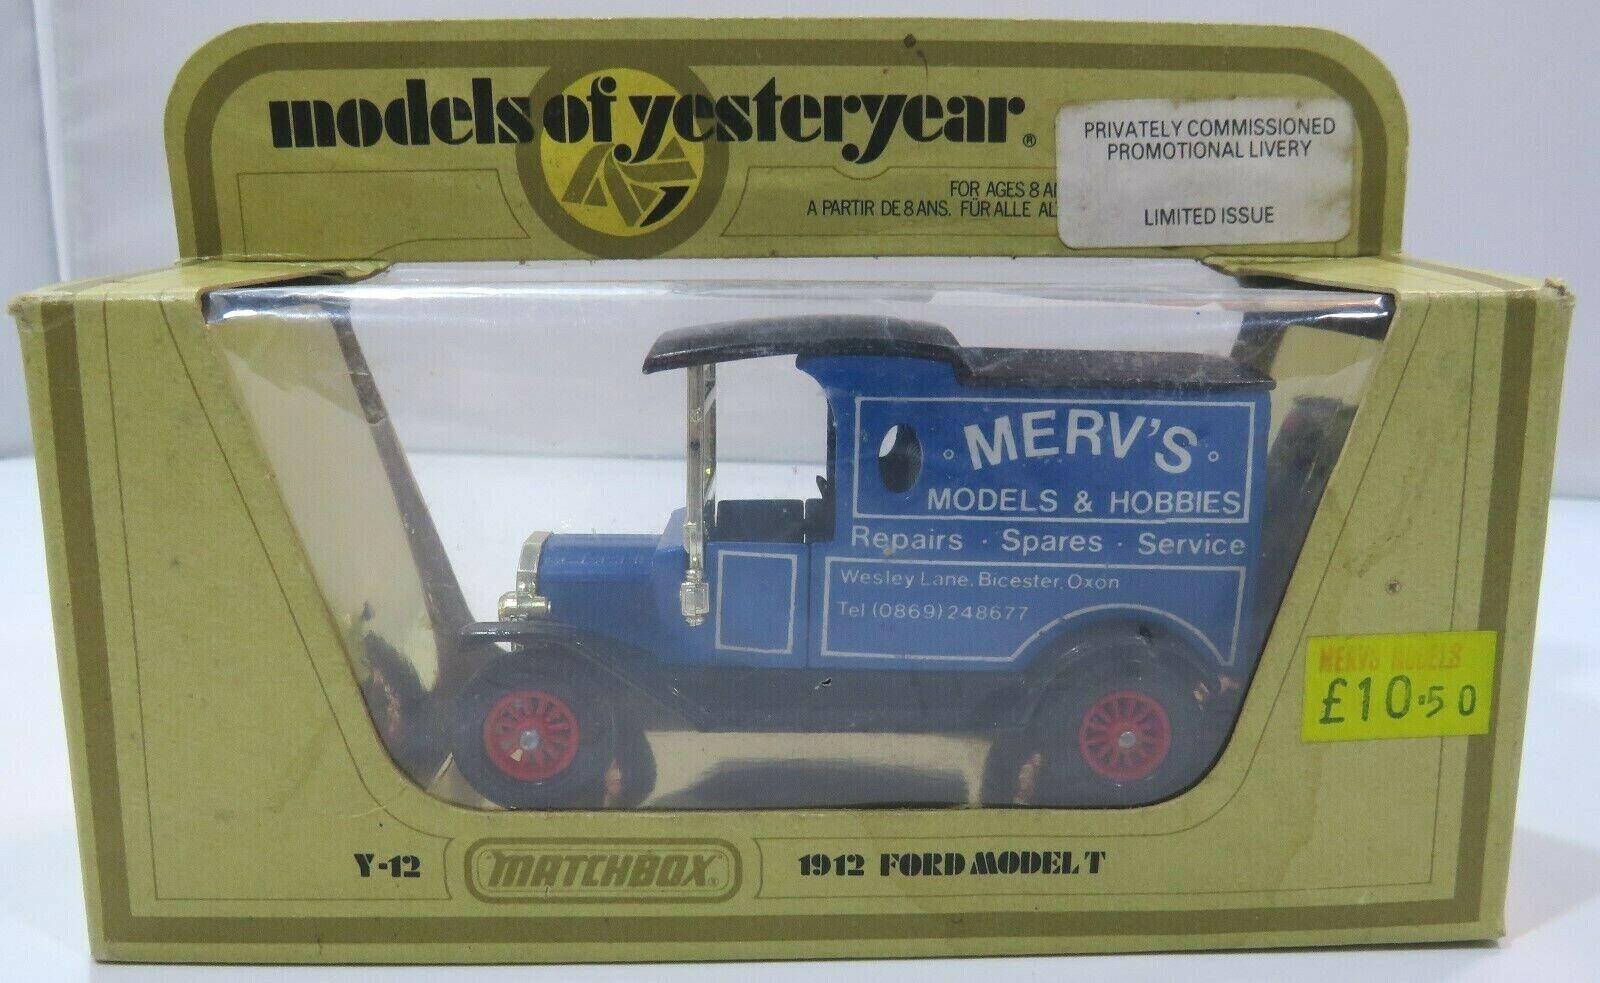 scatolaed Matchscatola modello s of Yesteryear Y-12 modello Ford T Merv's modellos